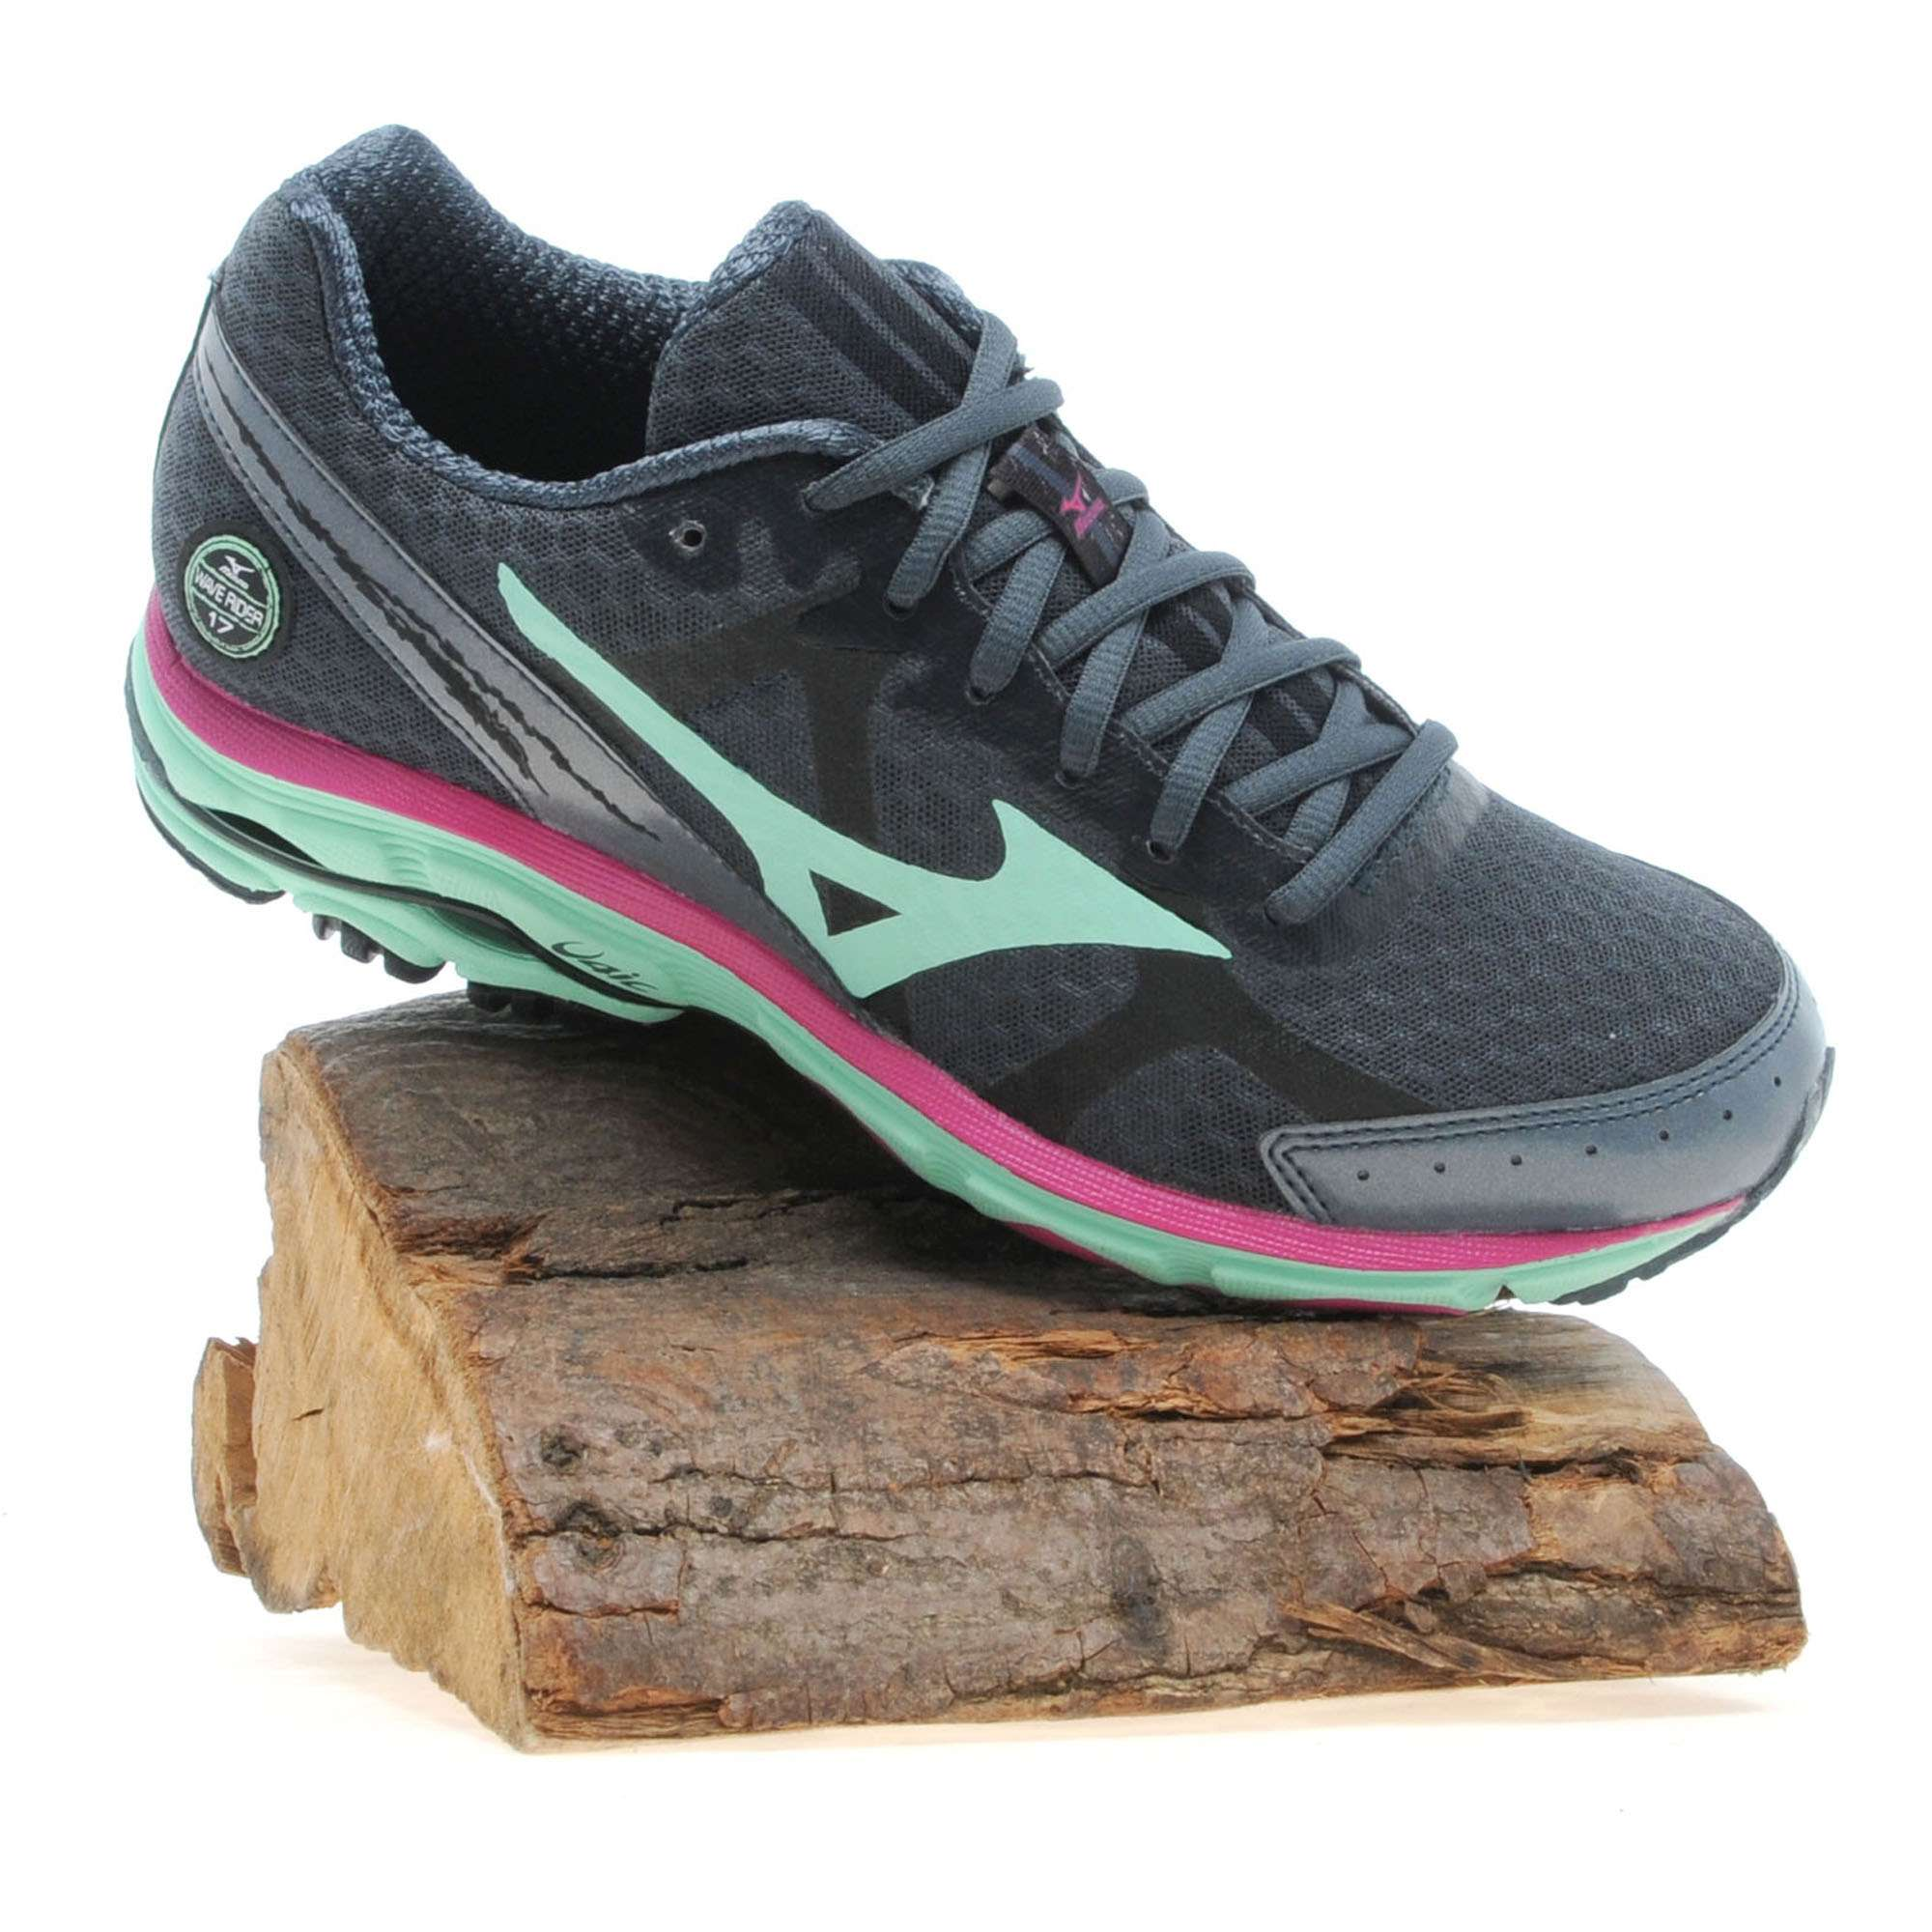 MIZUNO Women's Wave Rider 17 Trail Running Shoe